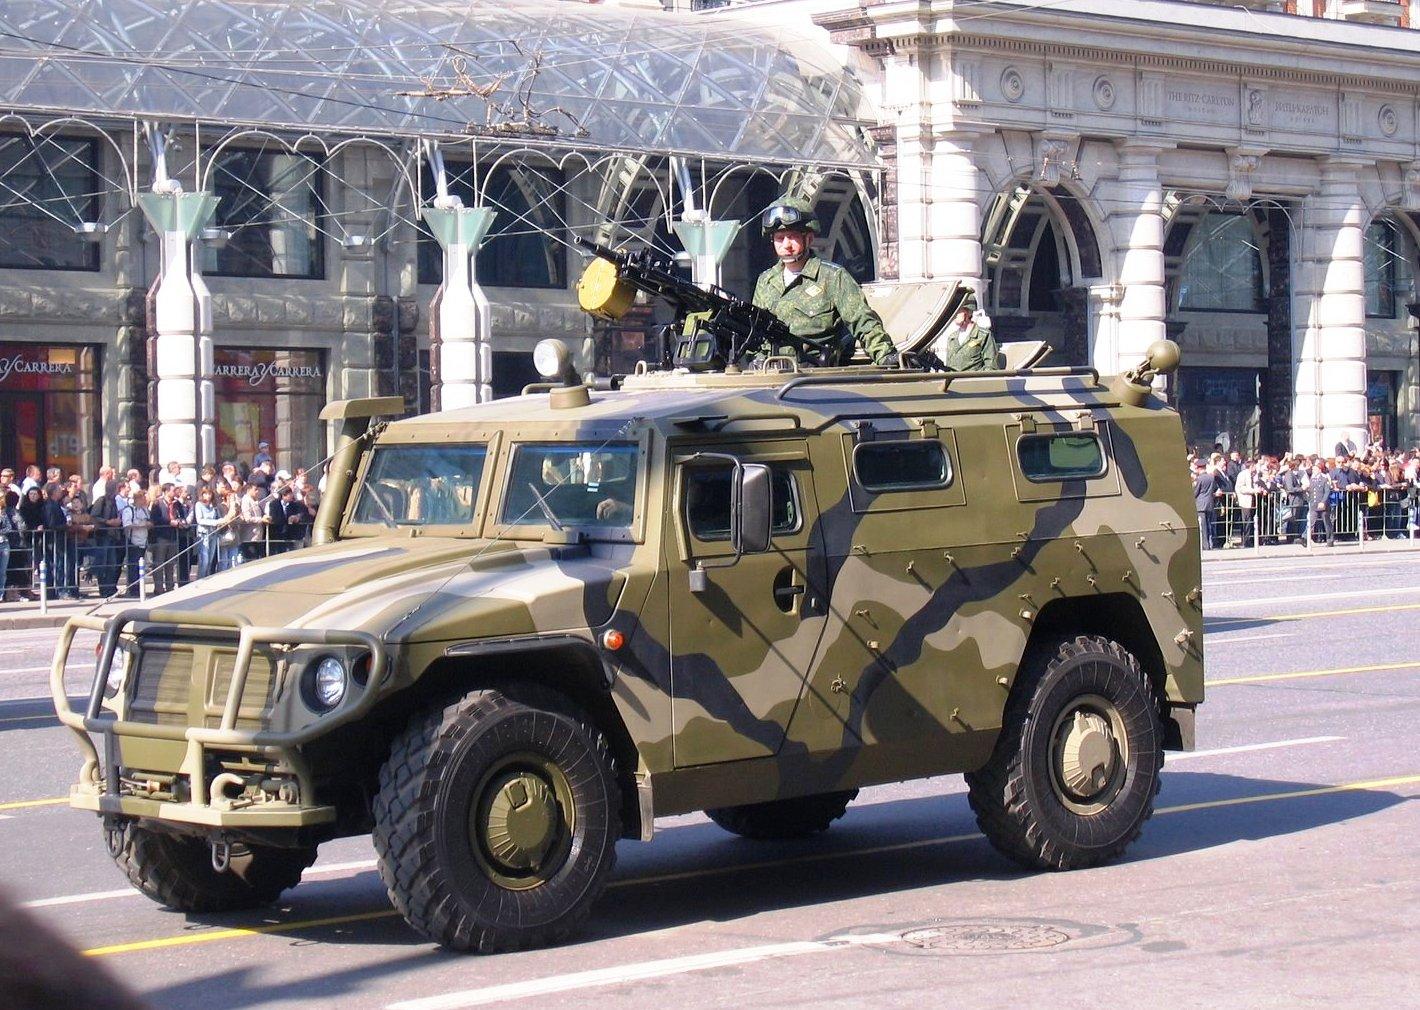 Russian GAZ Tigr